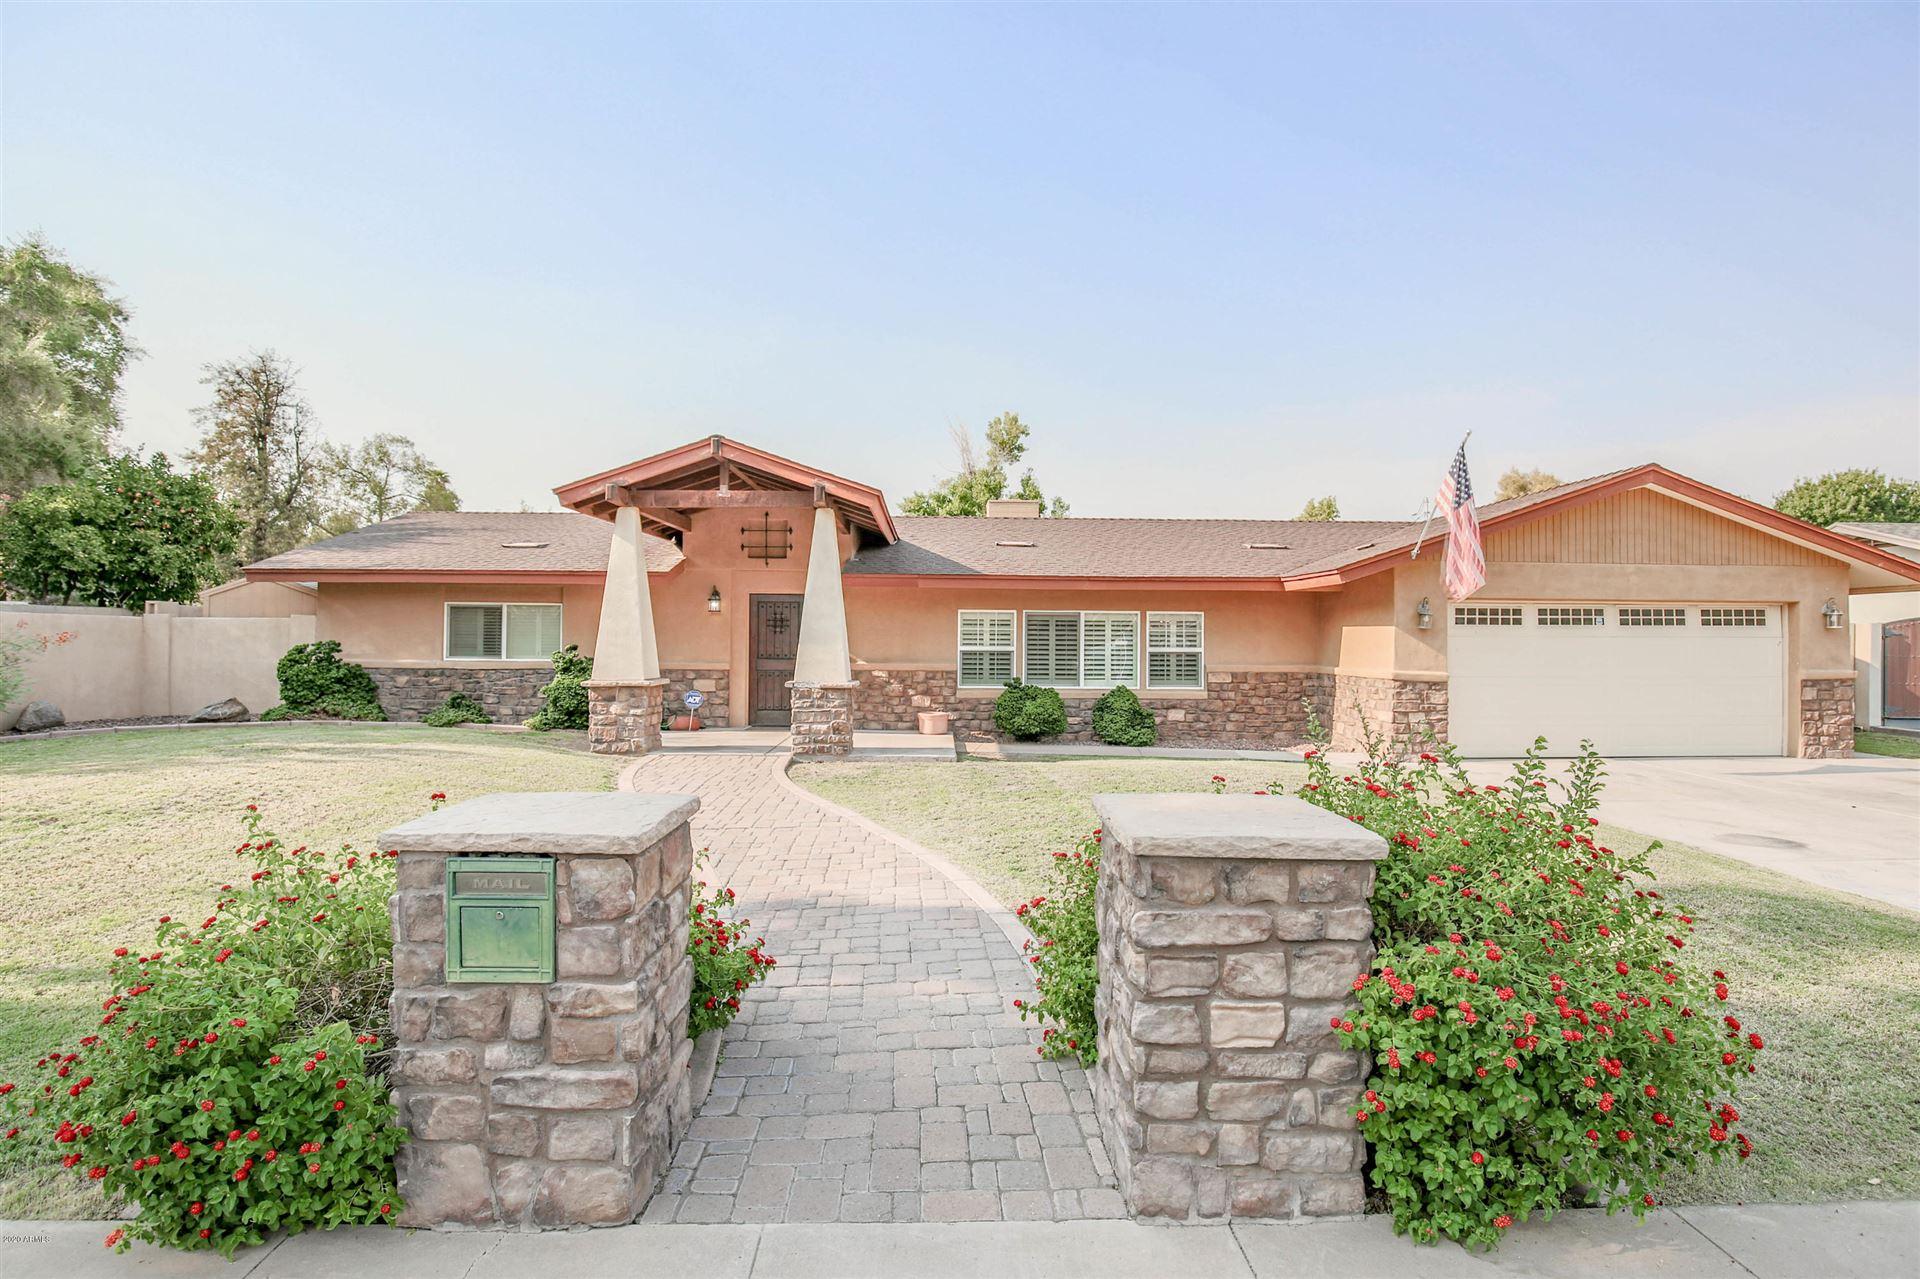 30 E HARMONT Drive, Phoenix, AZ 85020 - MLS#: 6118117